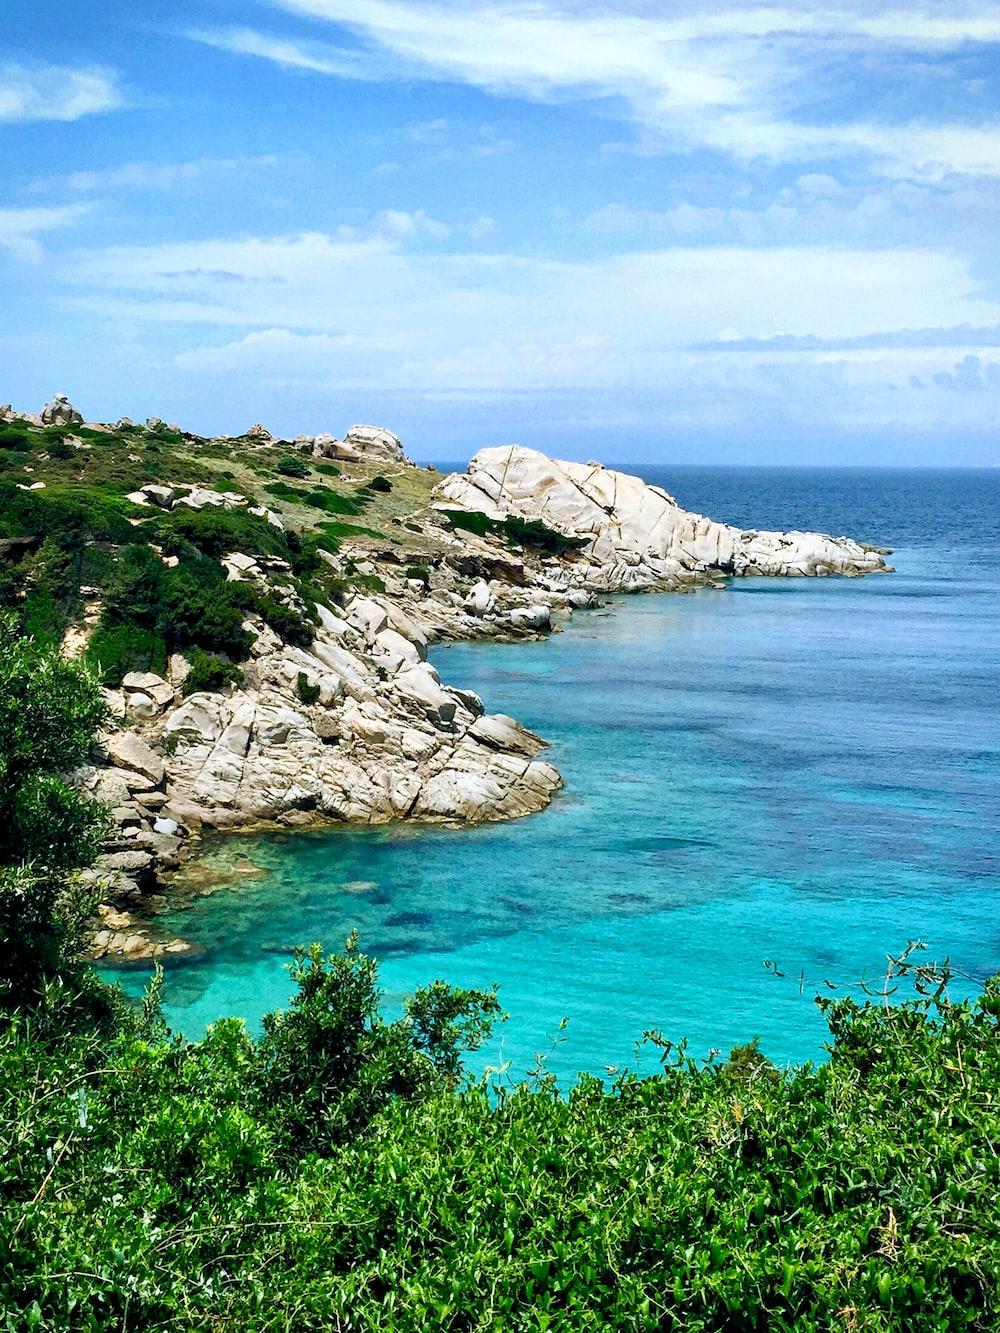 white rocky seashore with green vegetation during daytime